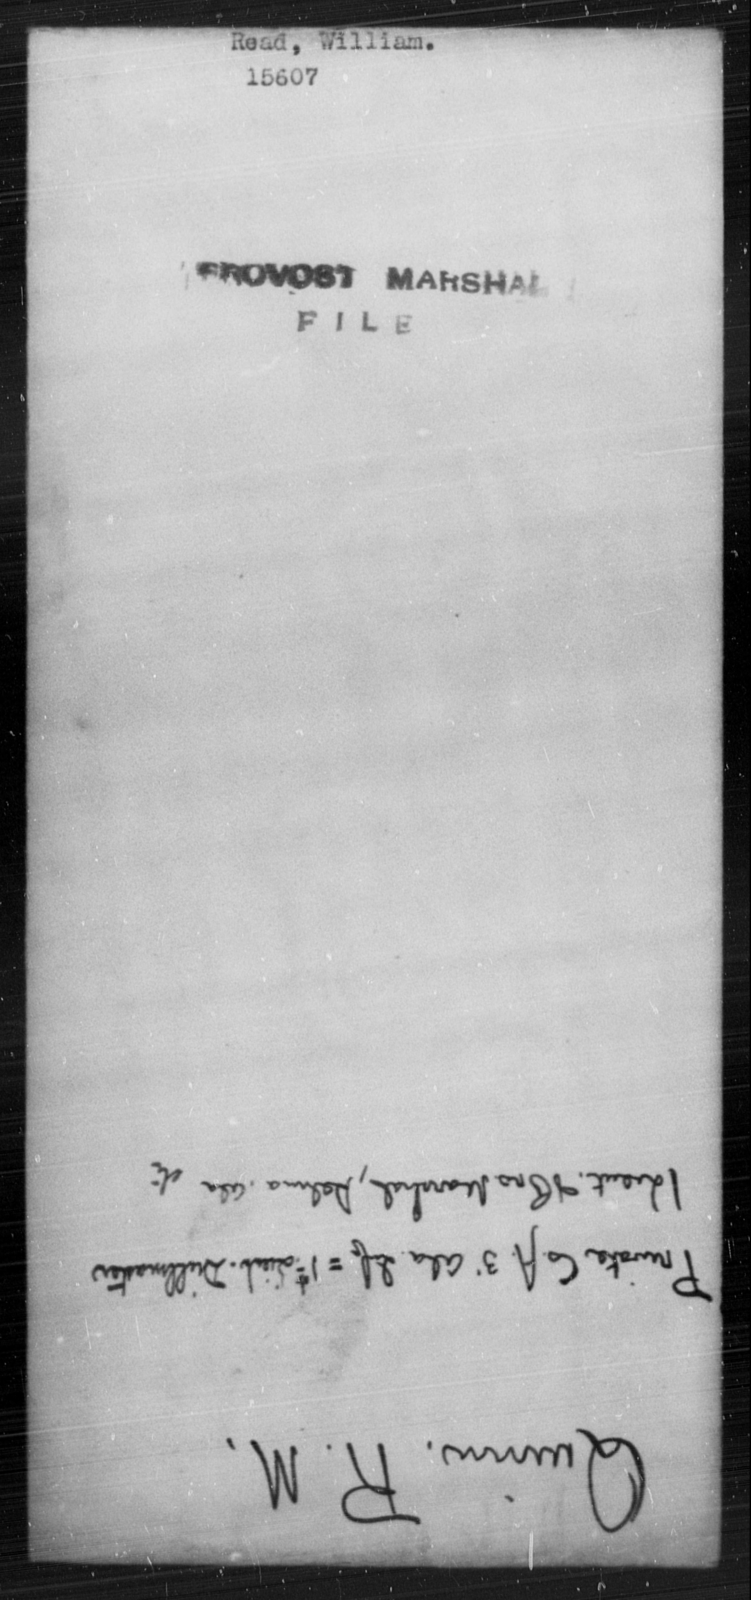 Read, William - State: [Blank] - Year: [Blank]